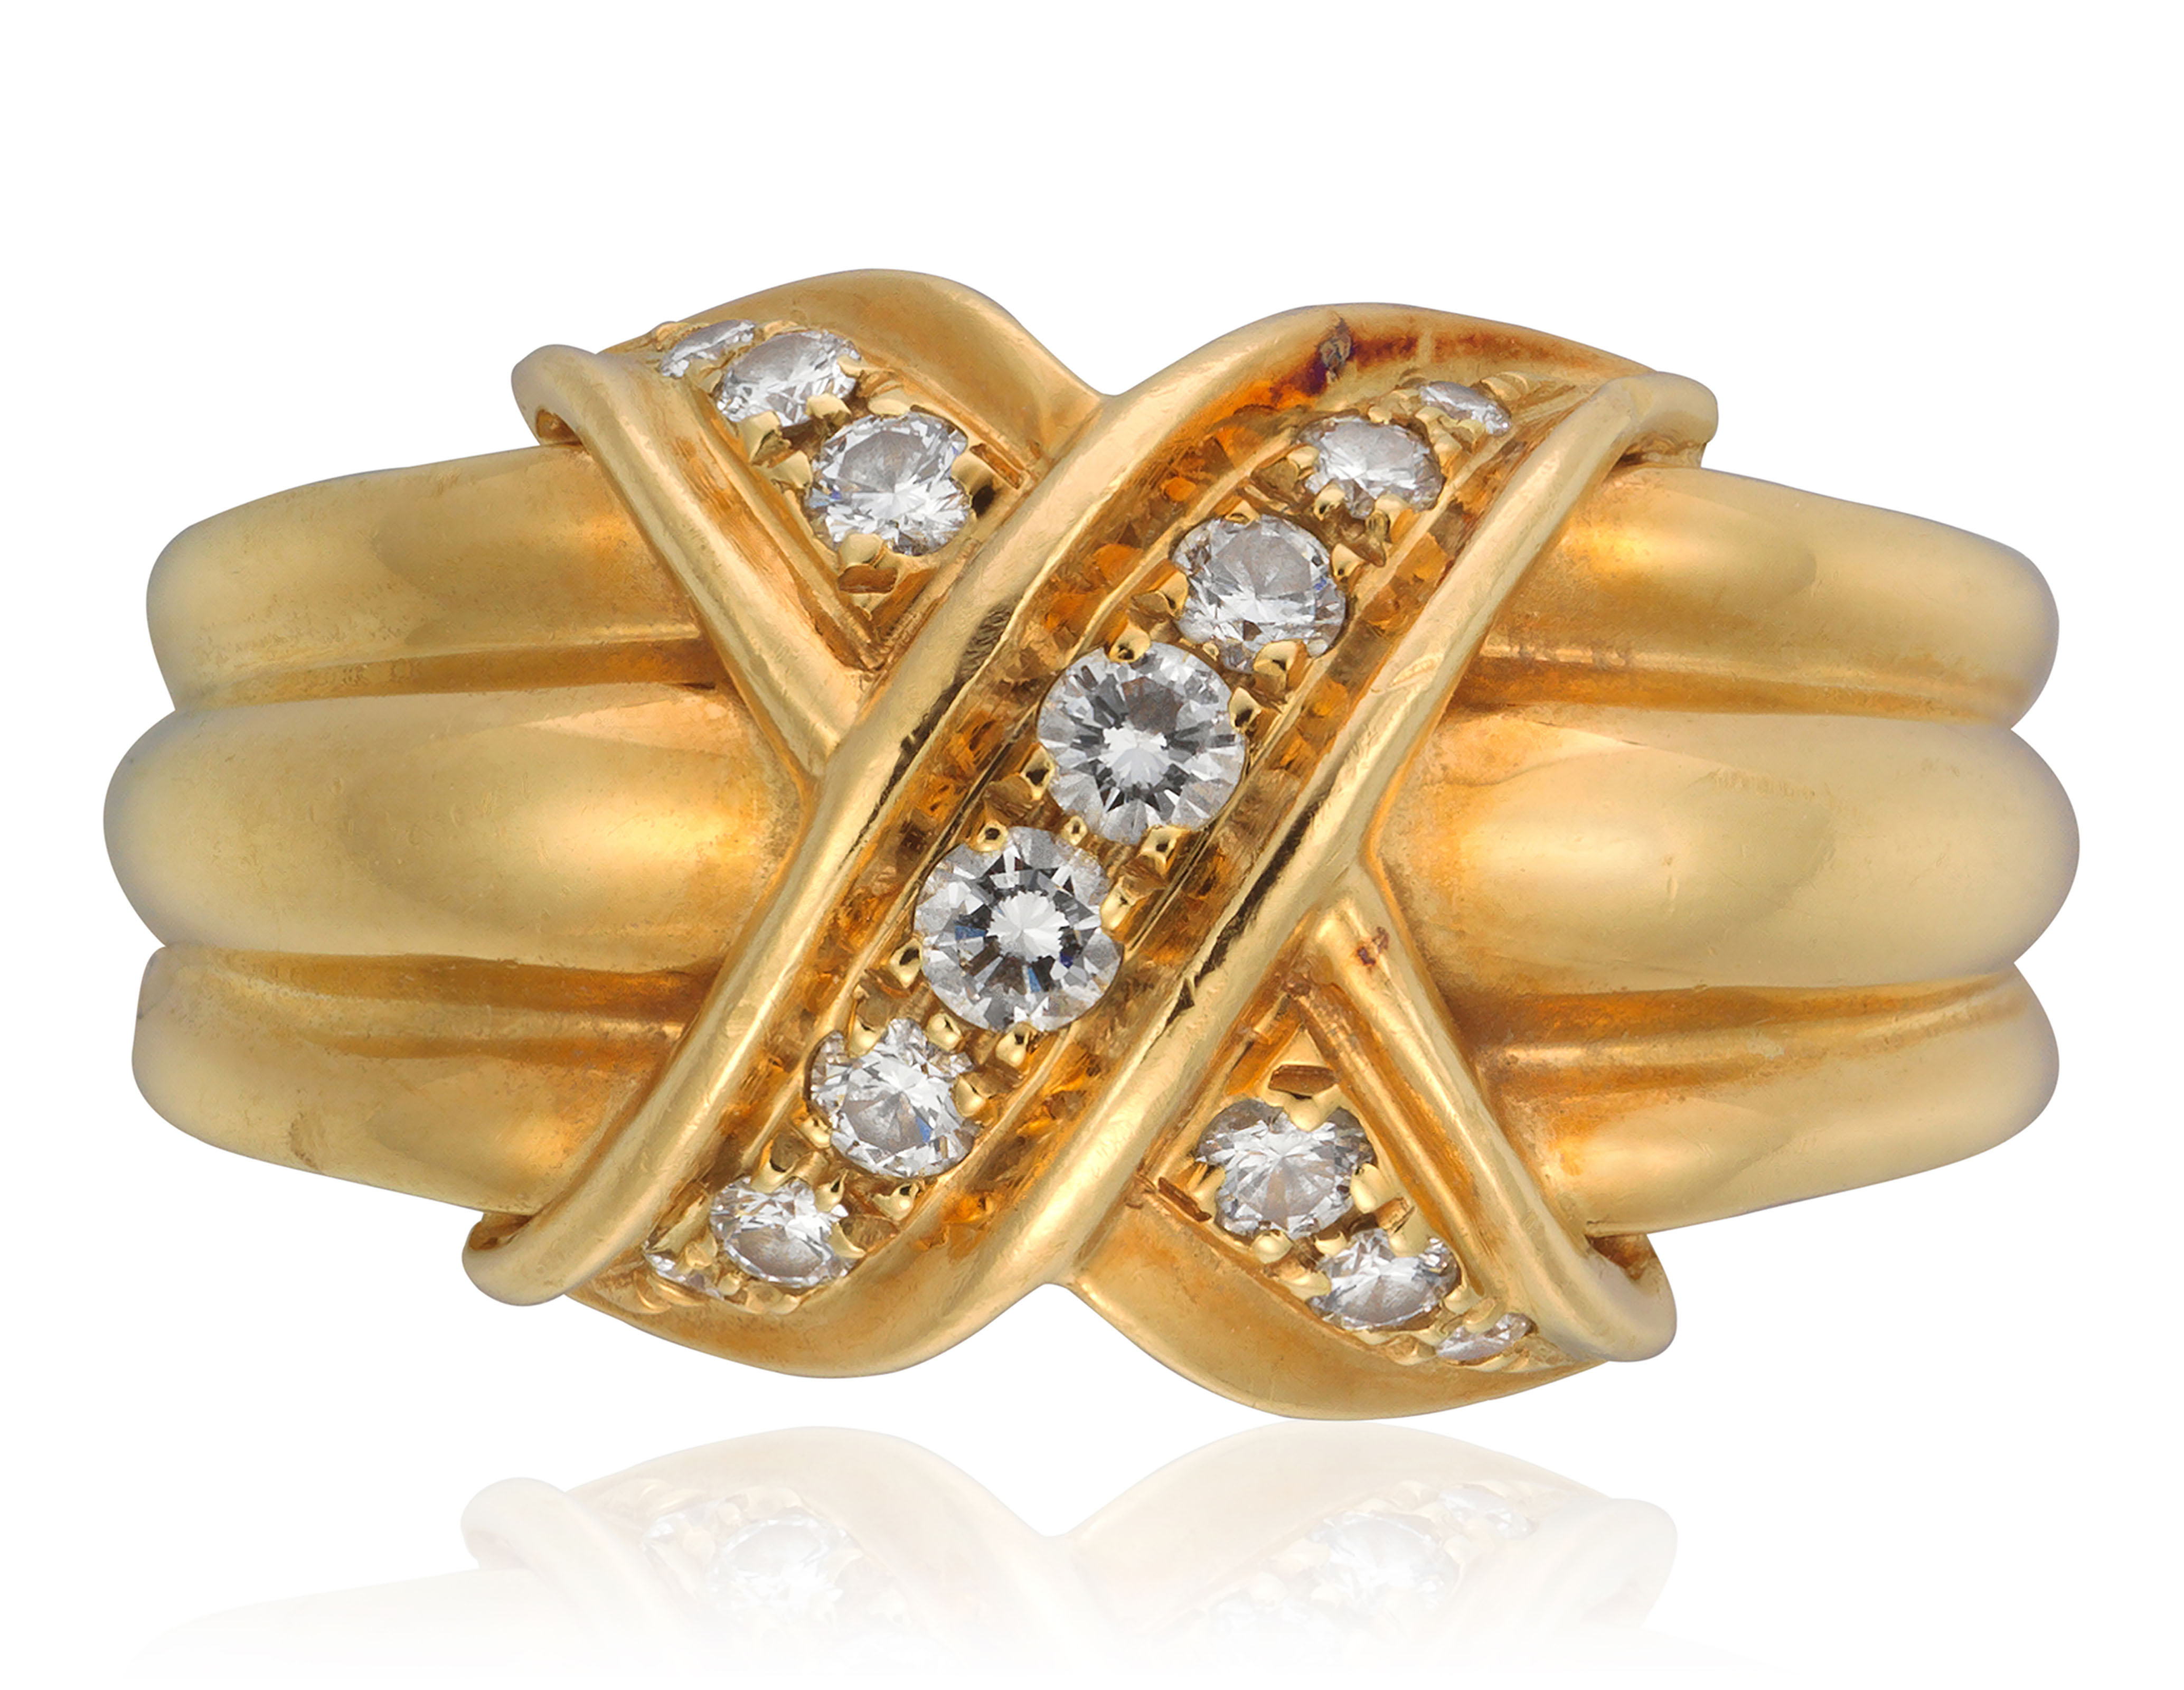 TIFFANY & CO. SET OF GOLD AND DIAMOND JEWELRY